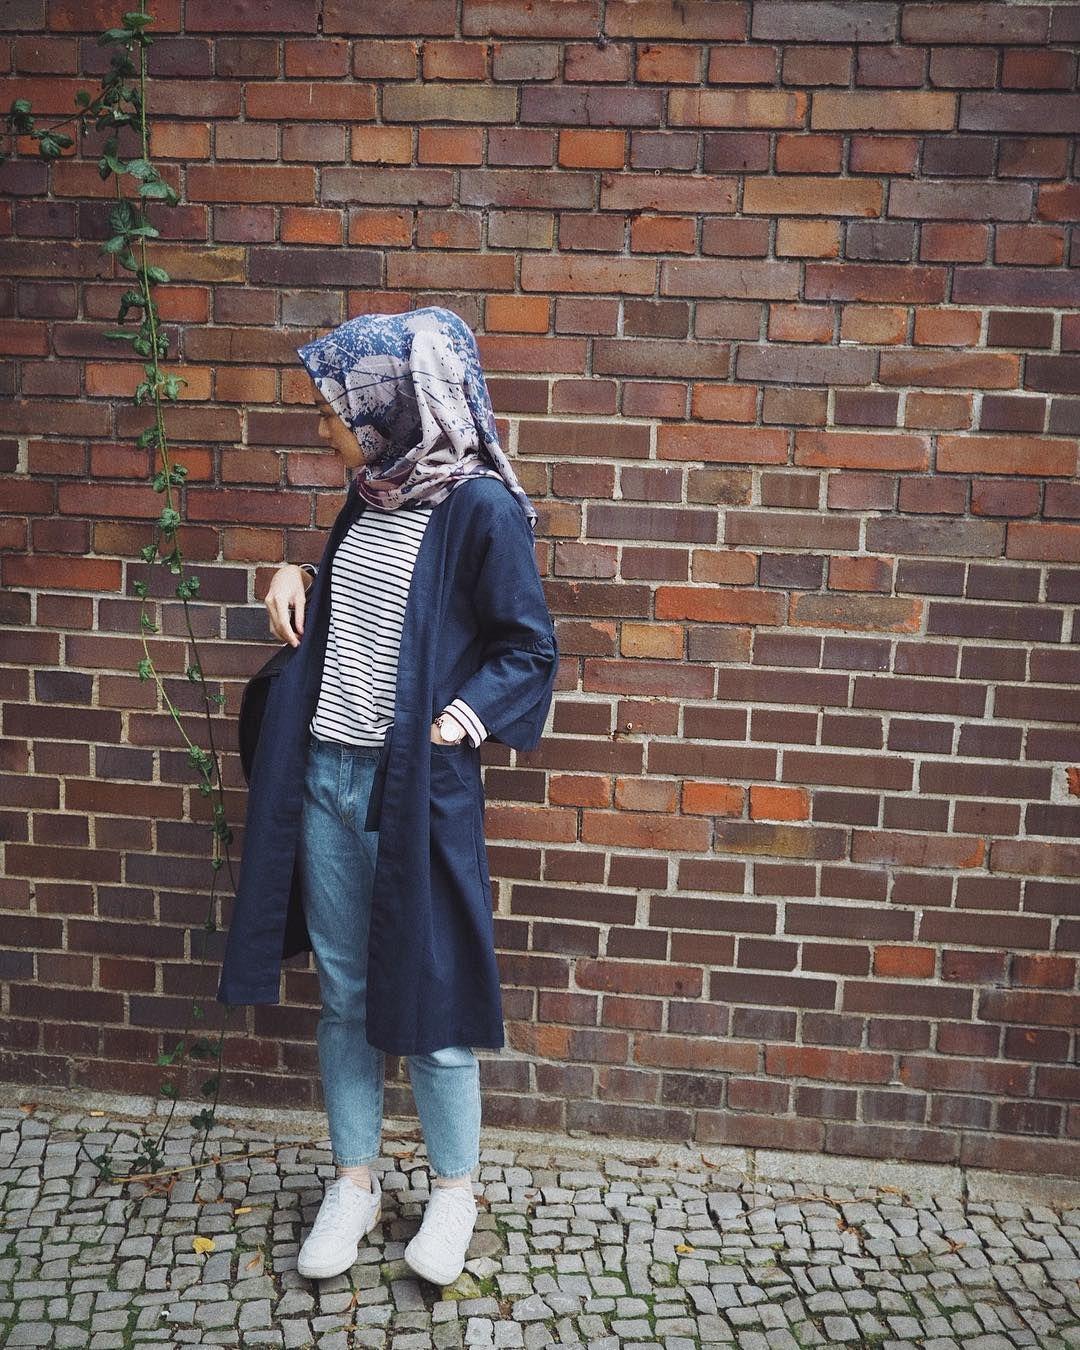 Warna Jilbab Yang Cocok Untuk Baju Navy